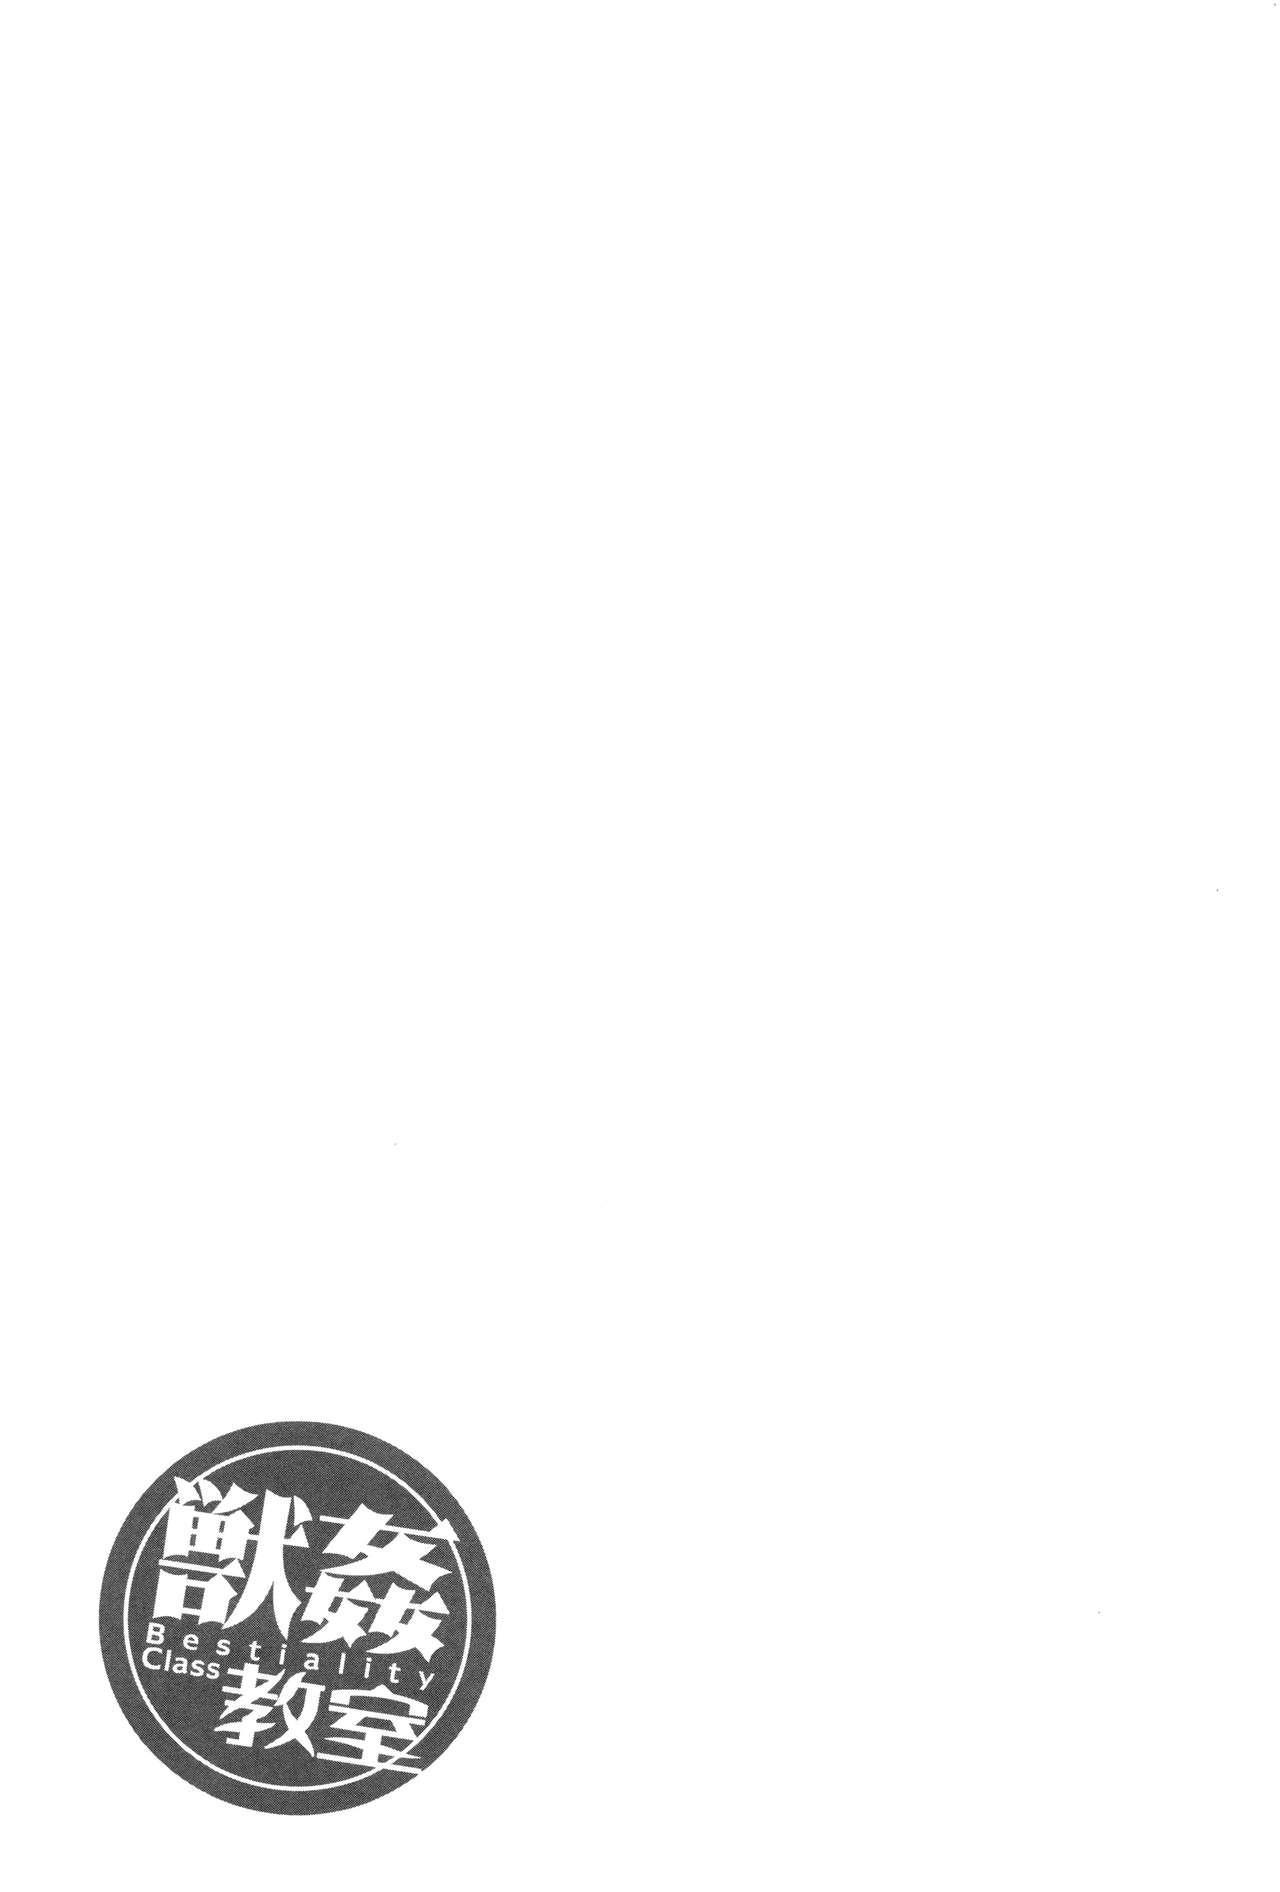 Juukan Kyoushitsu - Bestiality Class 208